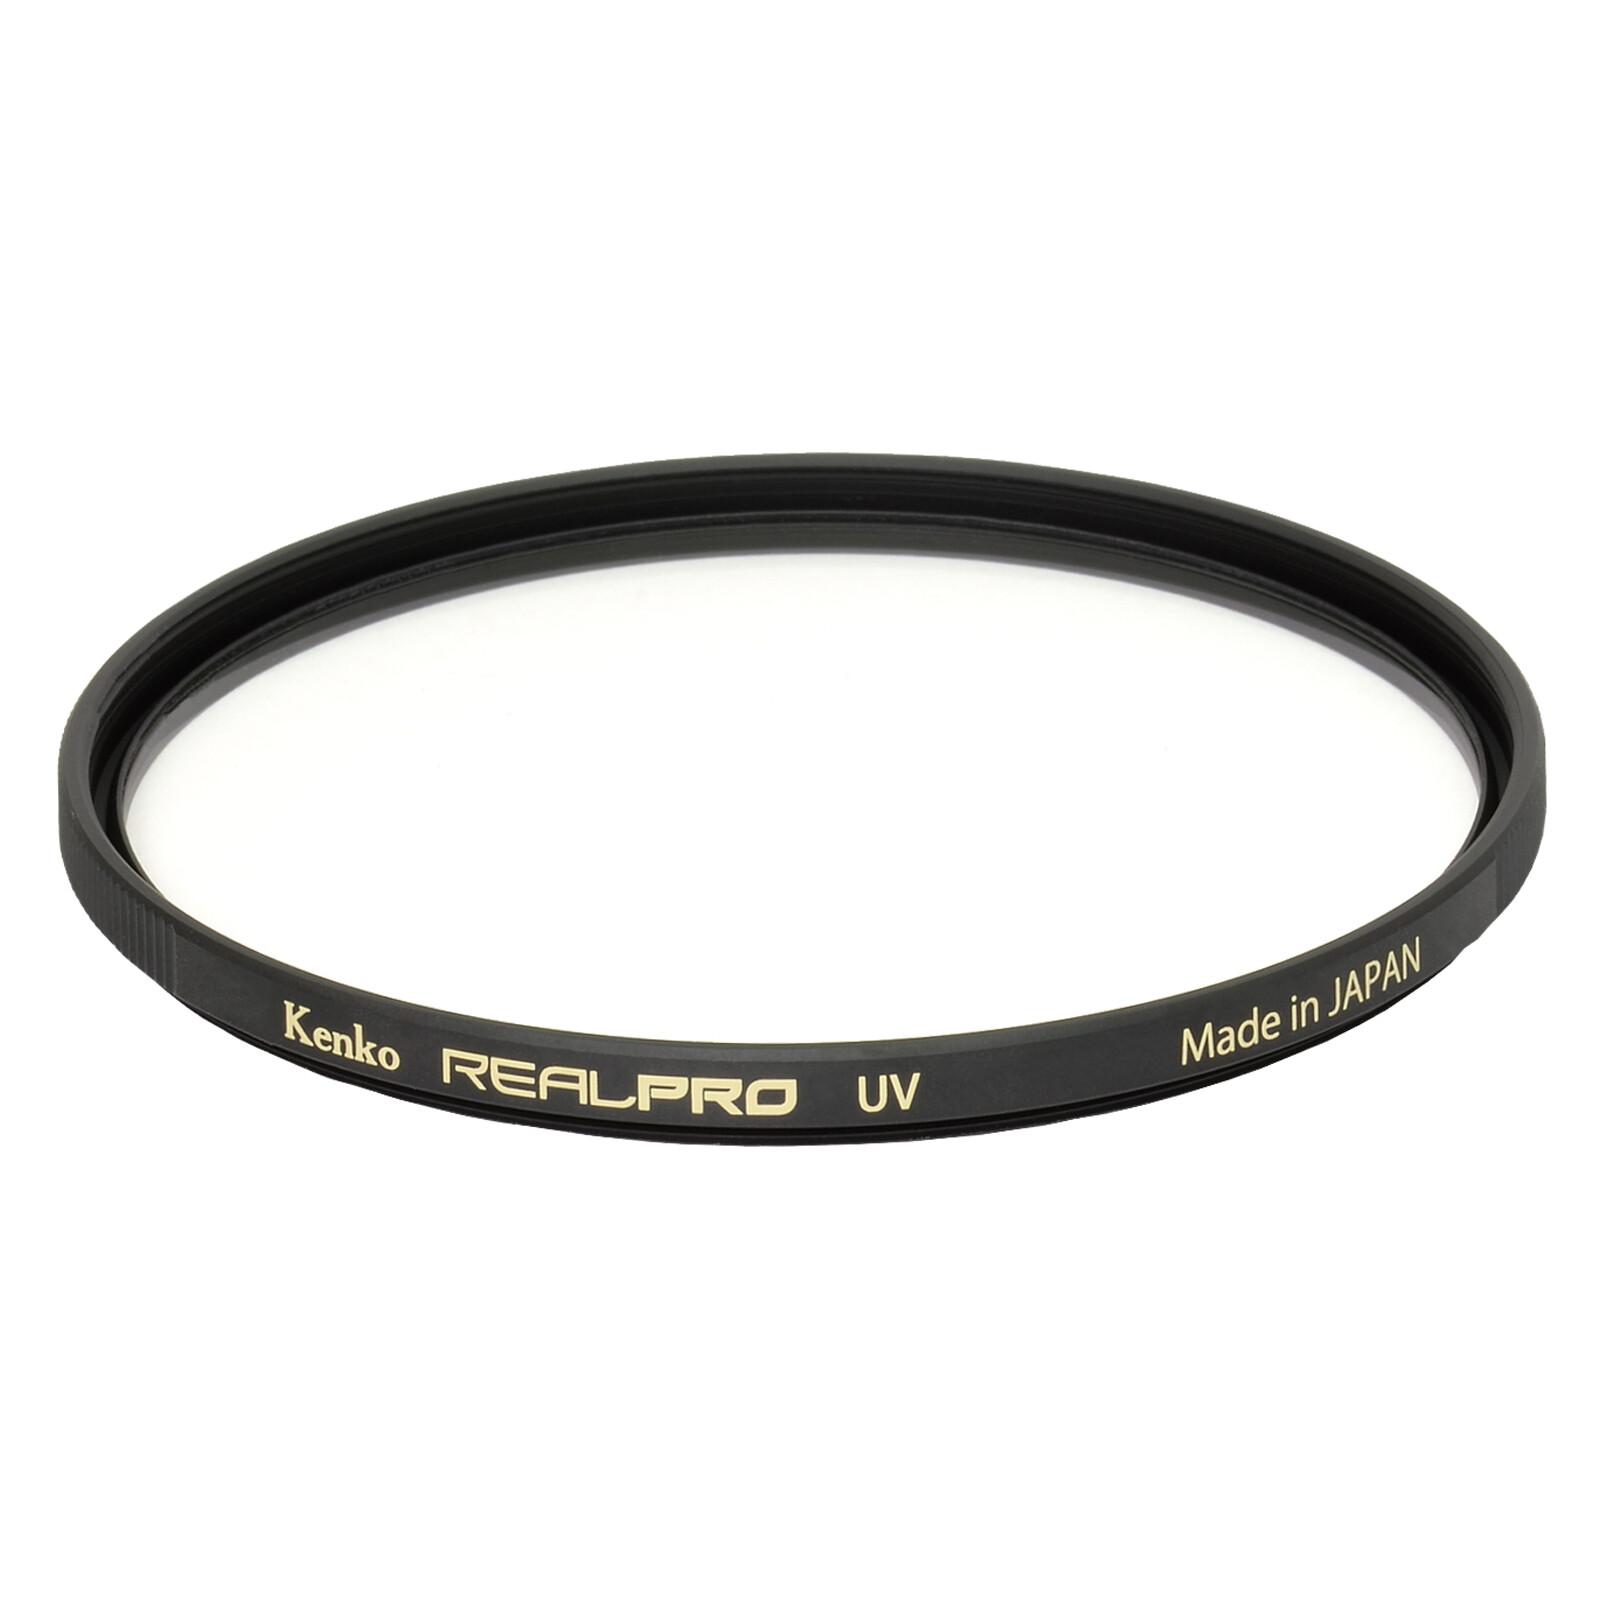 Kenko Real Pro UV 58mm Slim